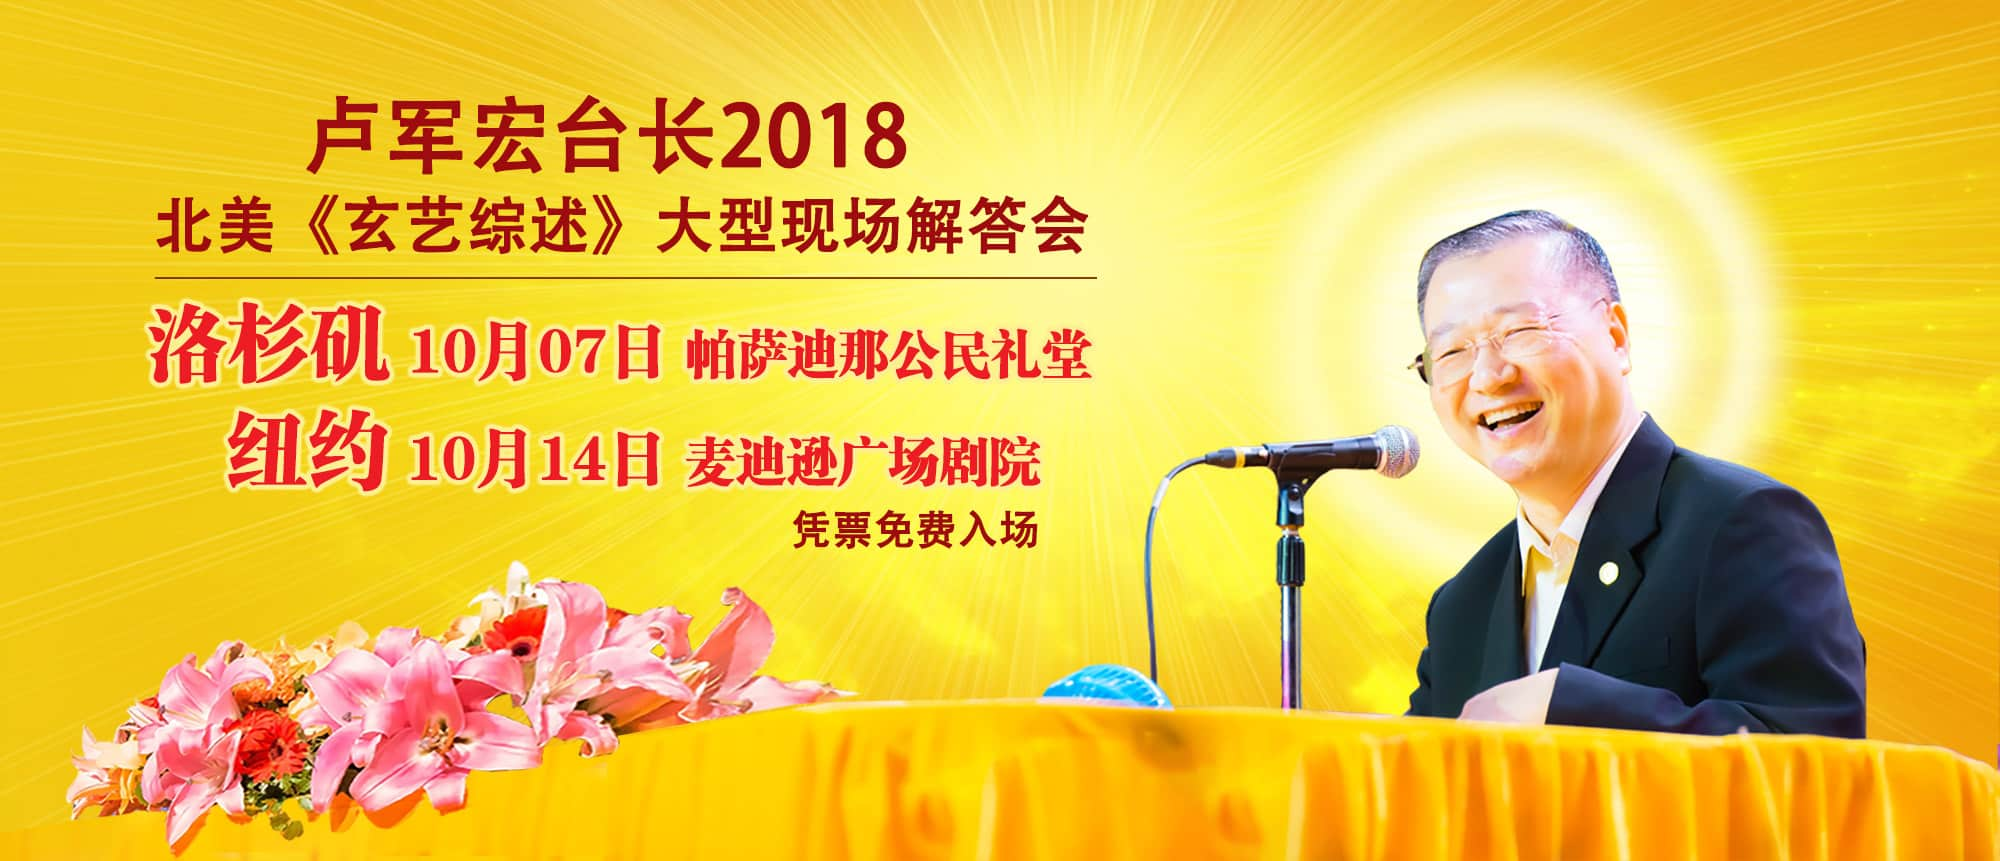 WeChat Image_20180819001553